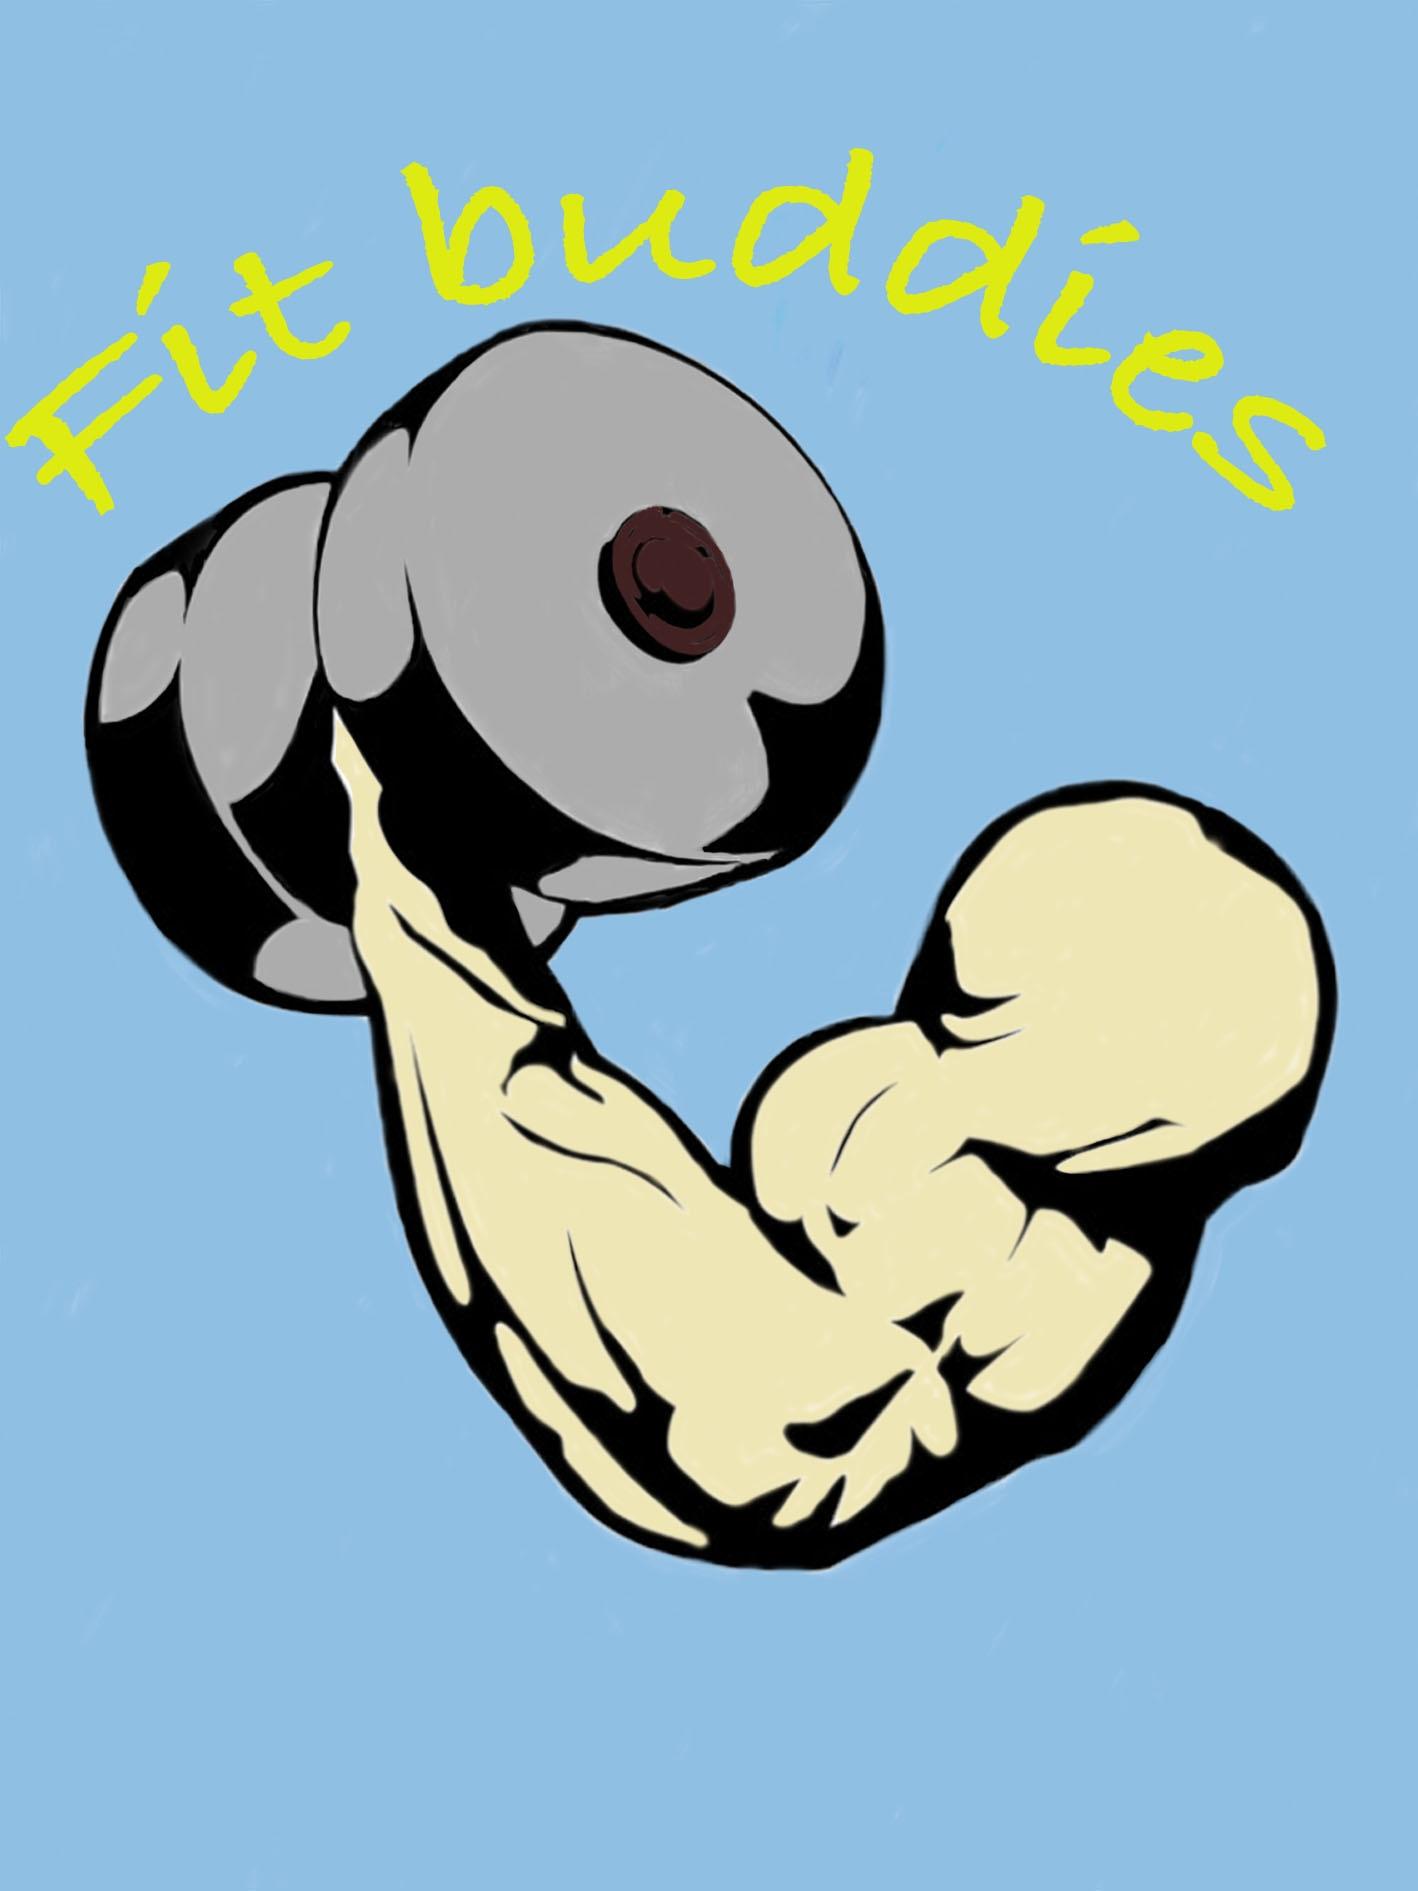 ABS (gym)